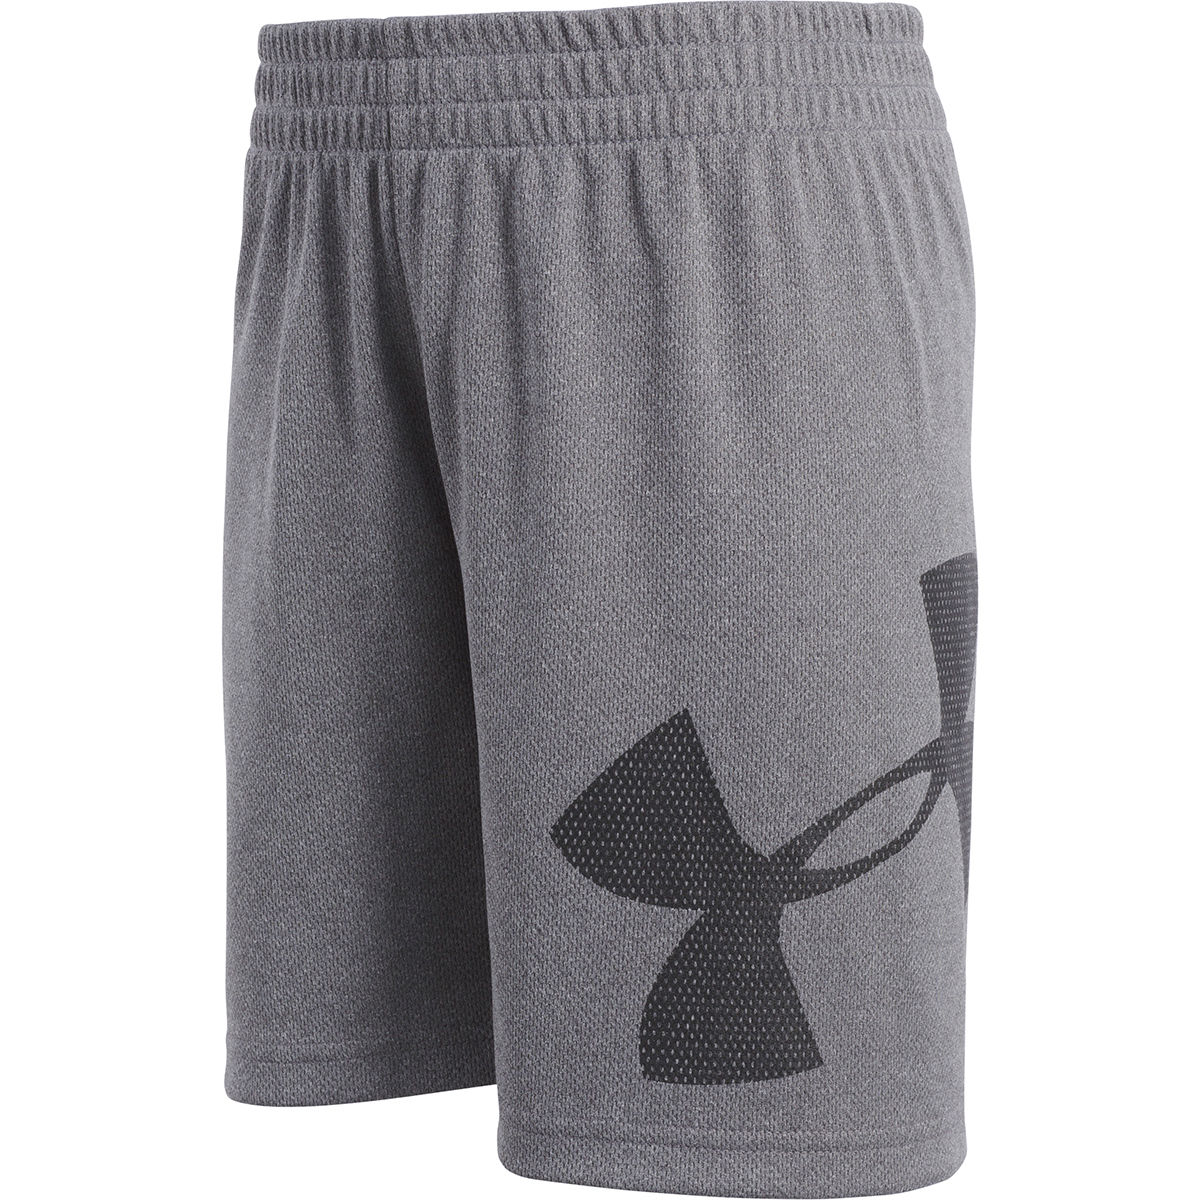 Under Armour Little Boys' Zoom Striker Shorts - Black, 6